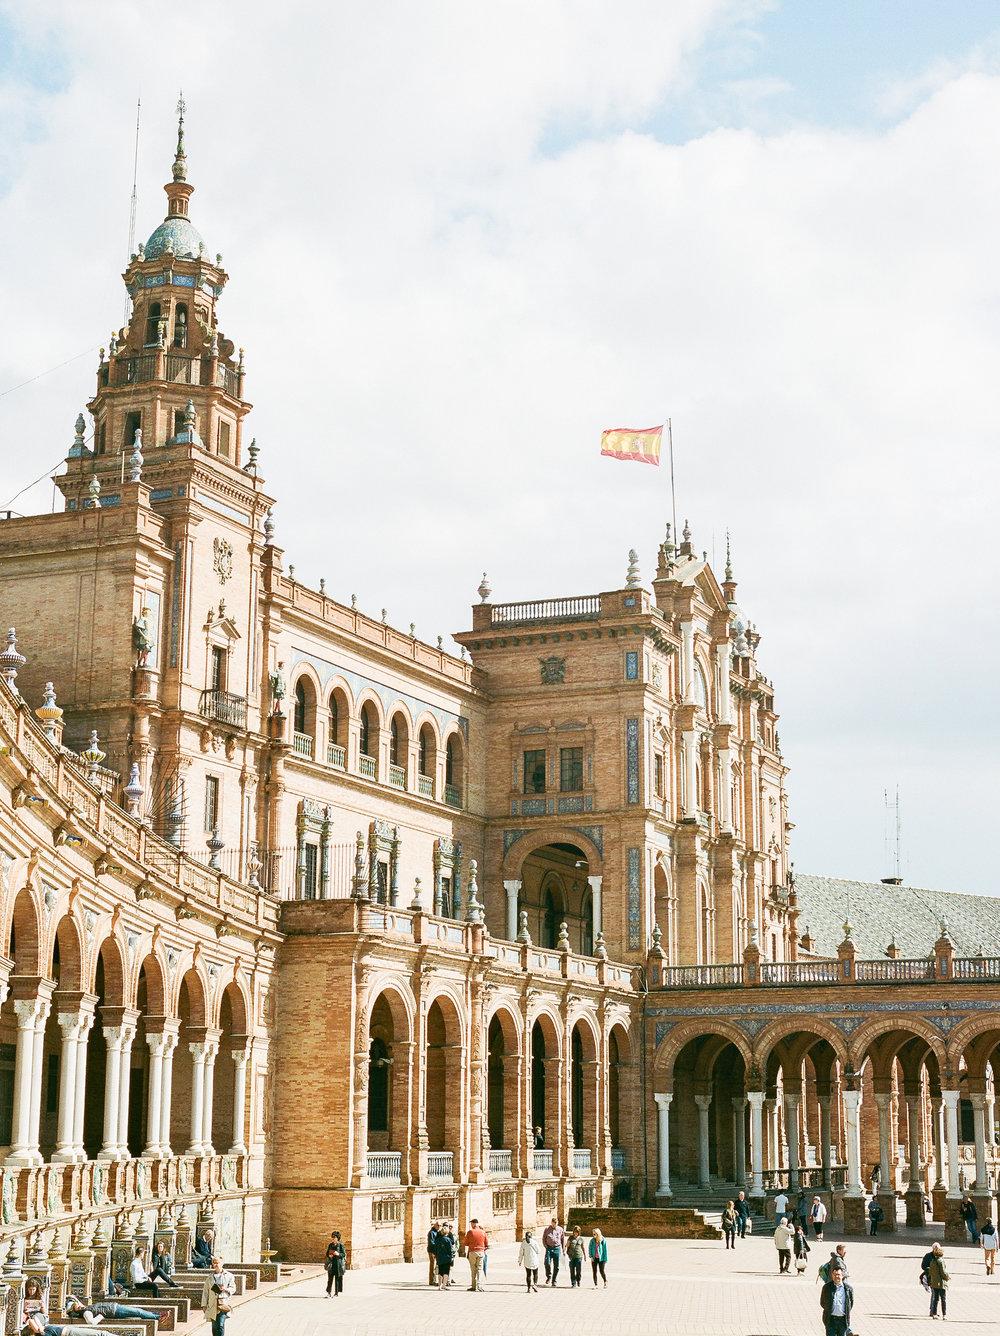 Plaza-de-espana-Seville-Spain-destination-photographer-143.jpg